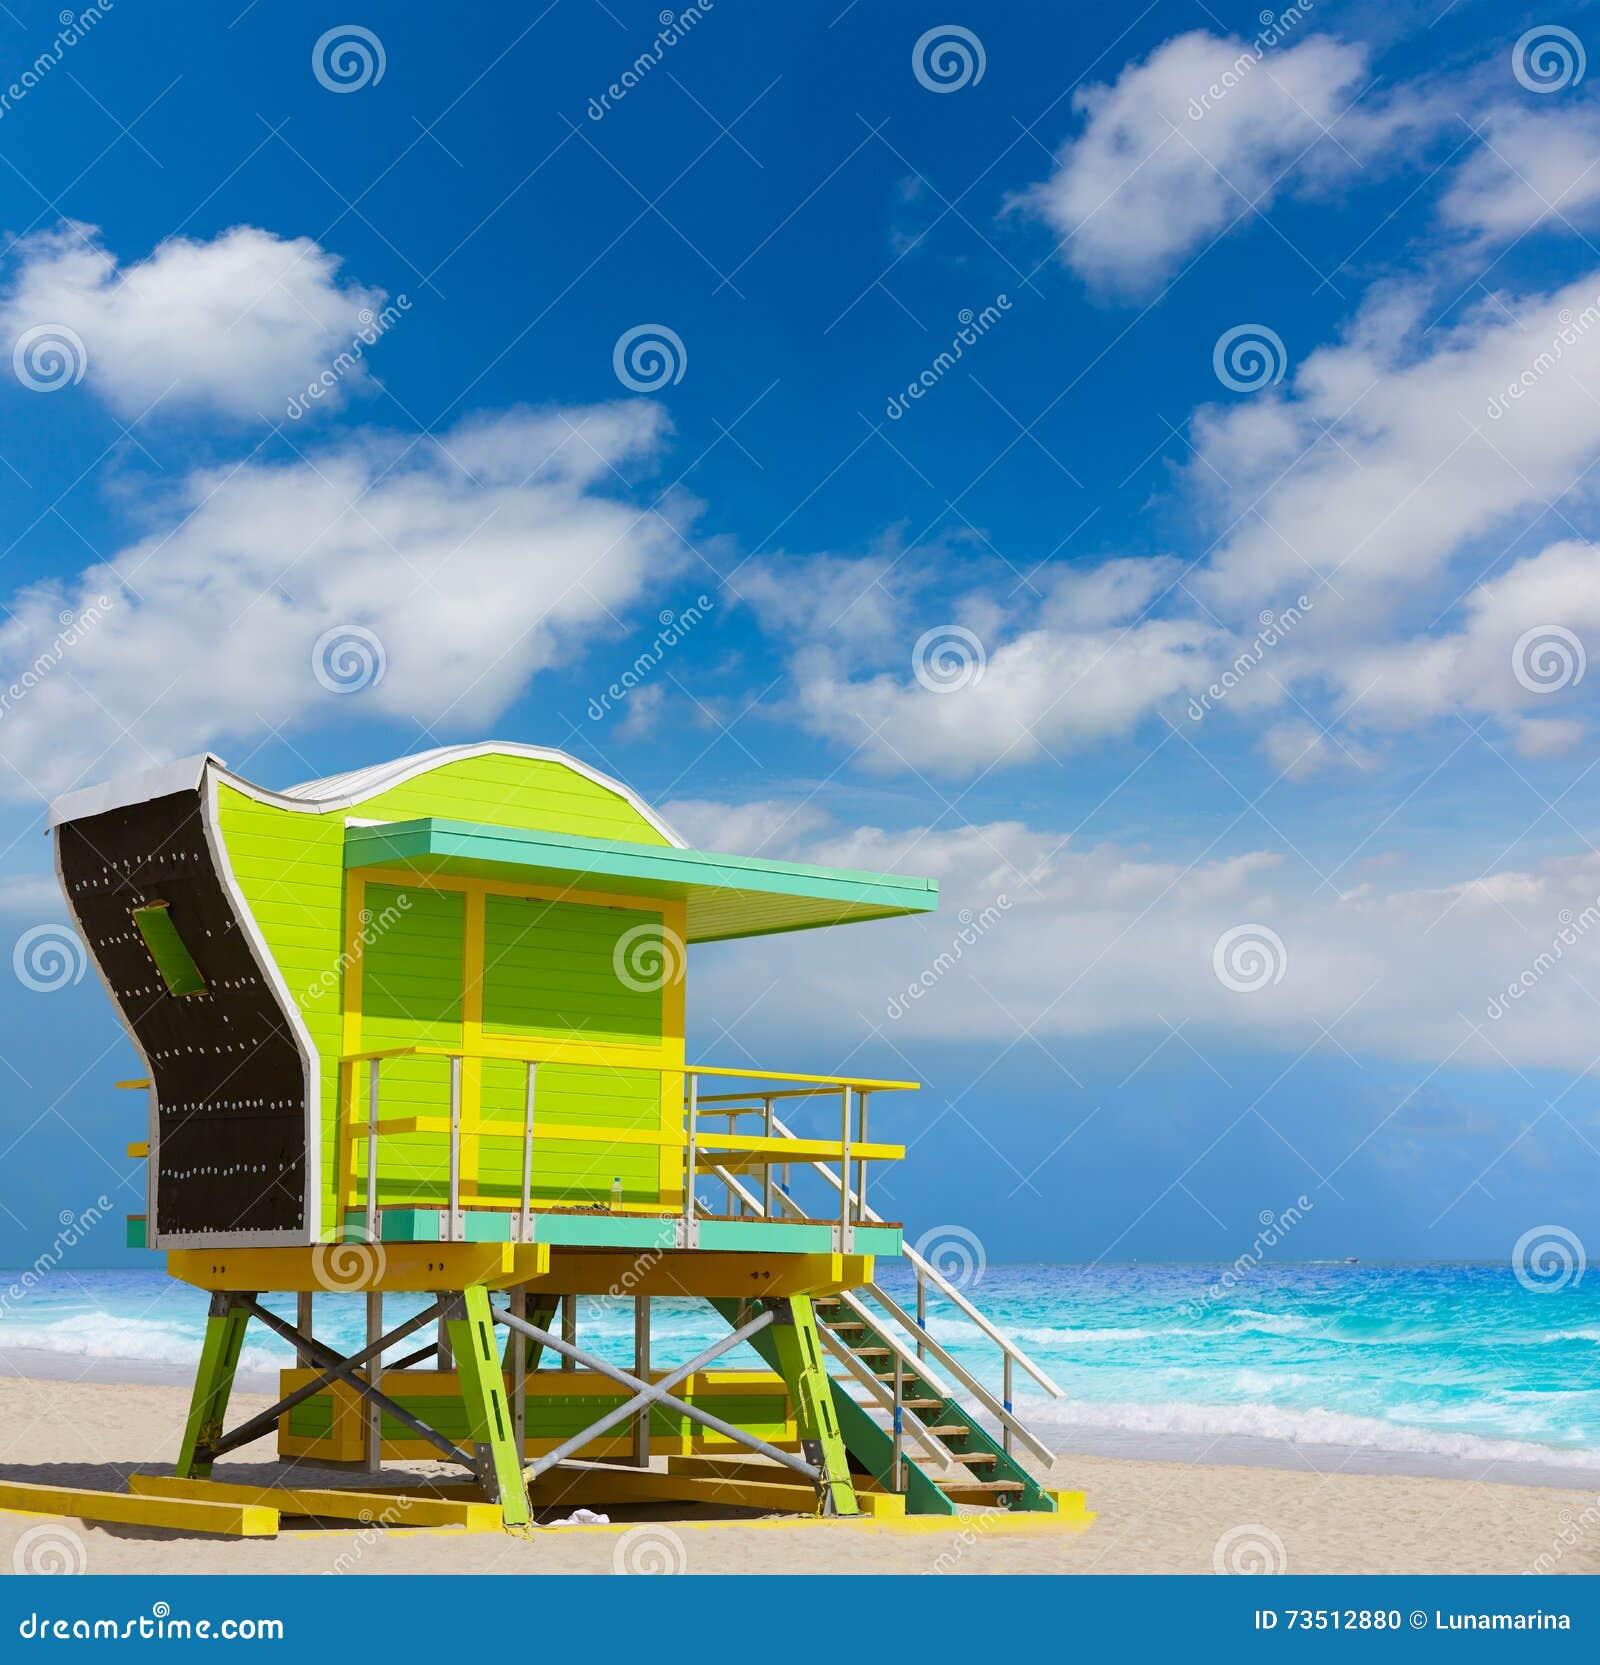 Tower House Miami Beach: Miami Beach Baywatch Tower South Beach Florida Royalty